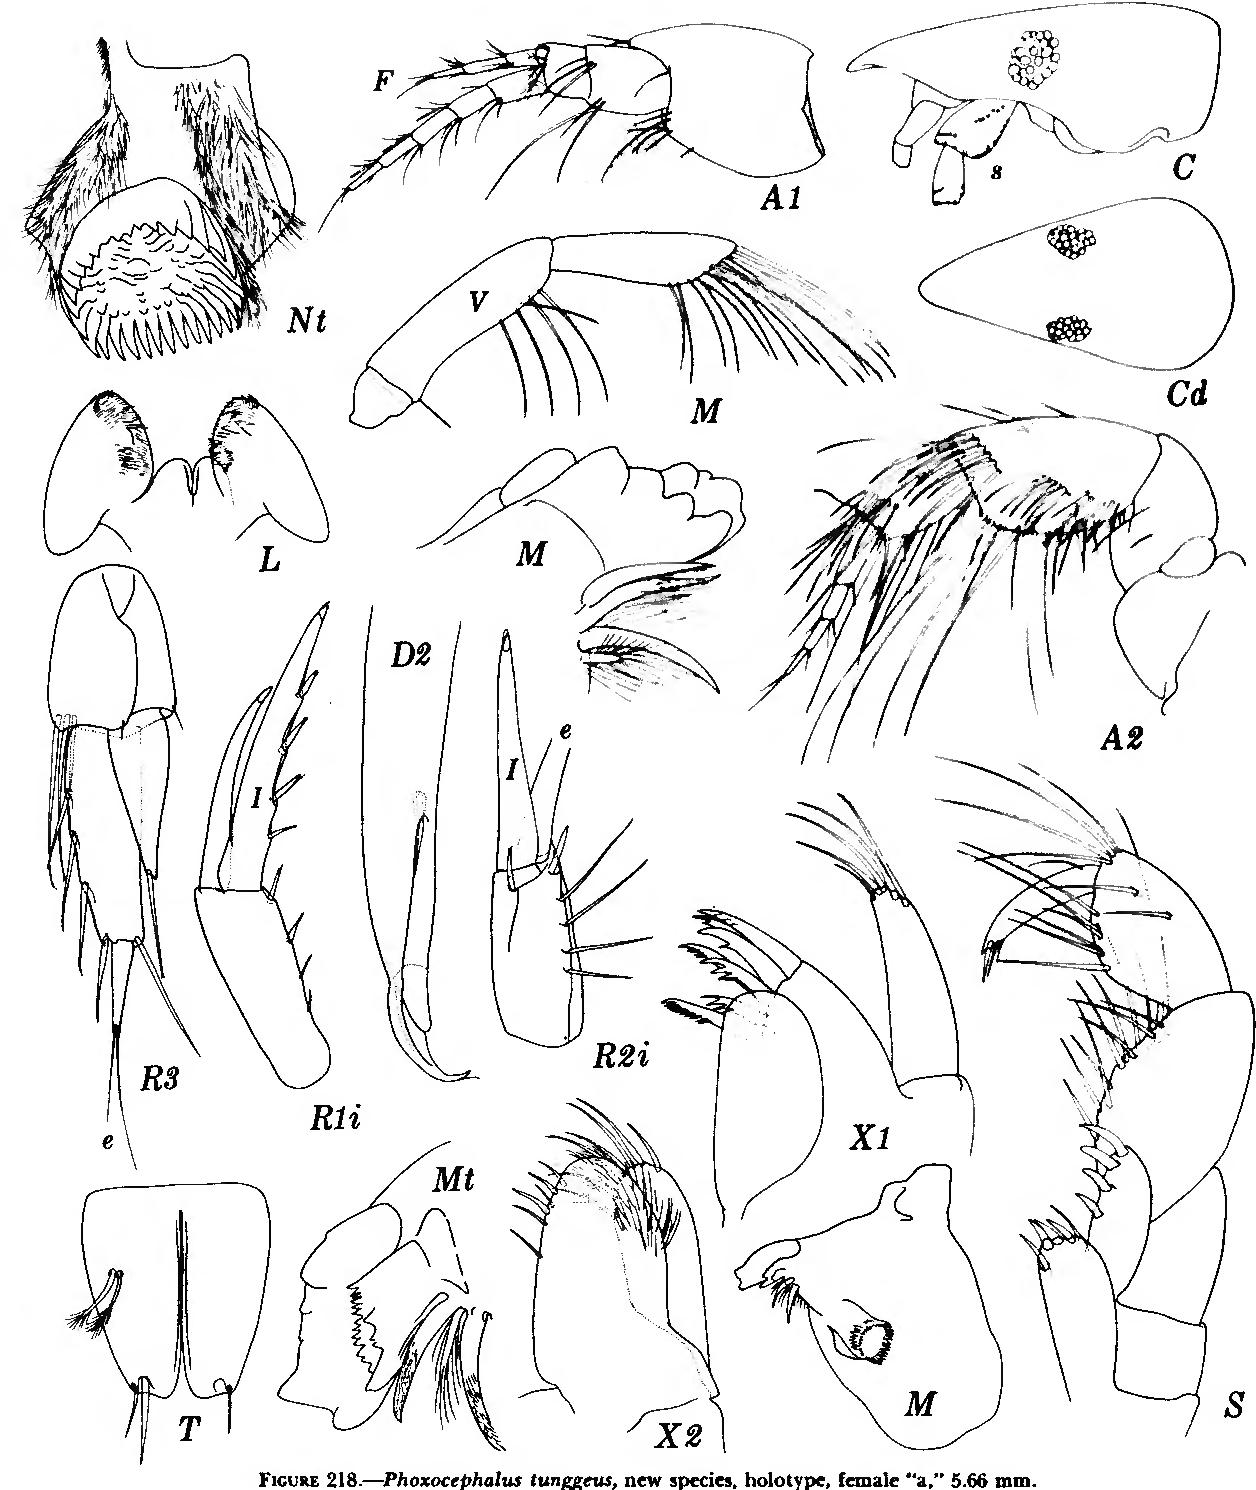 figure 218